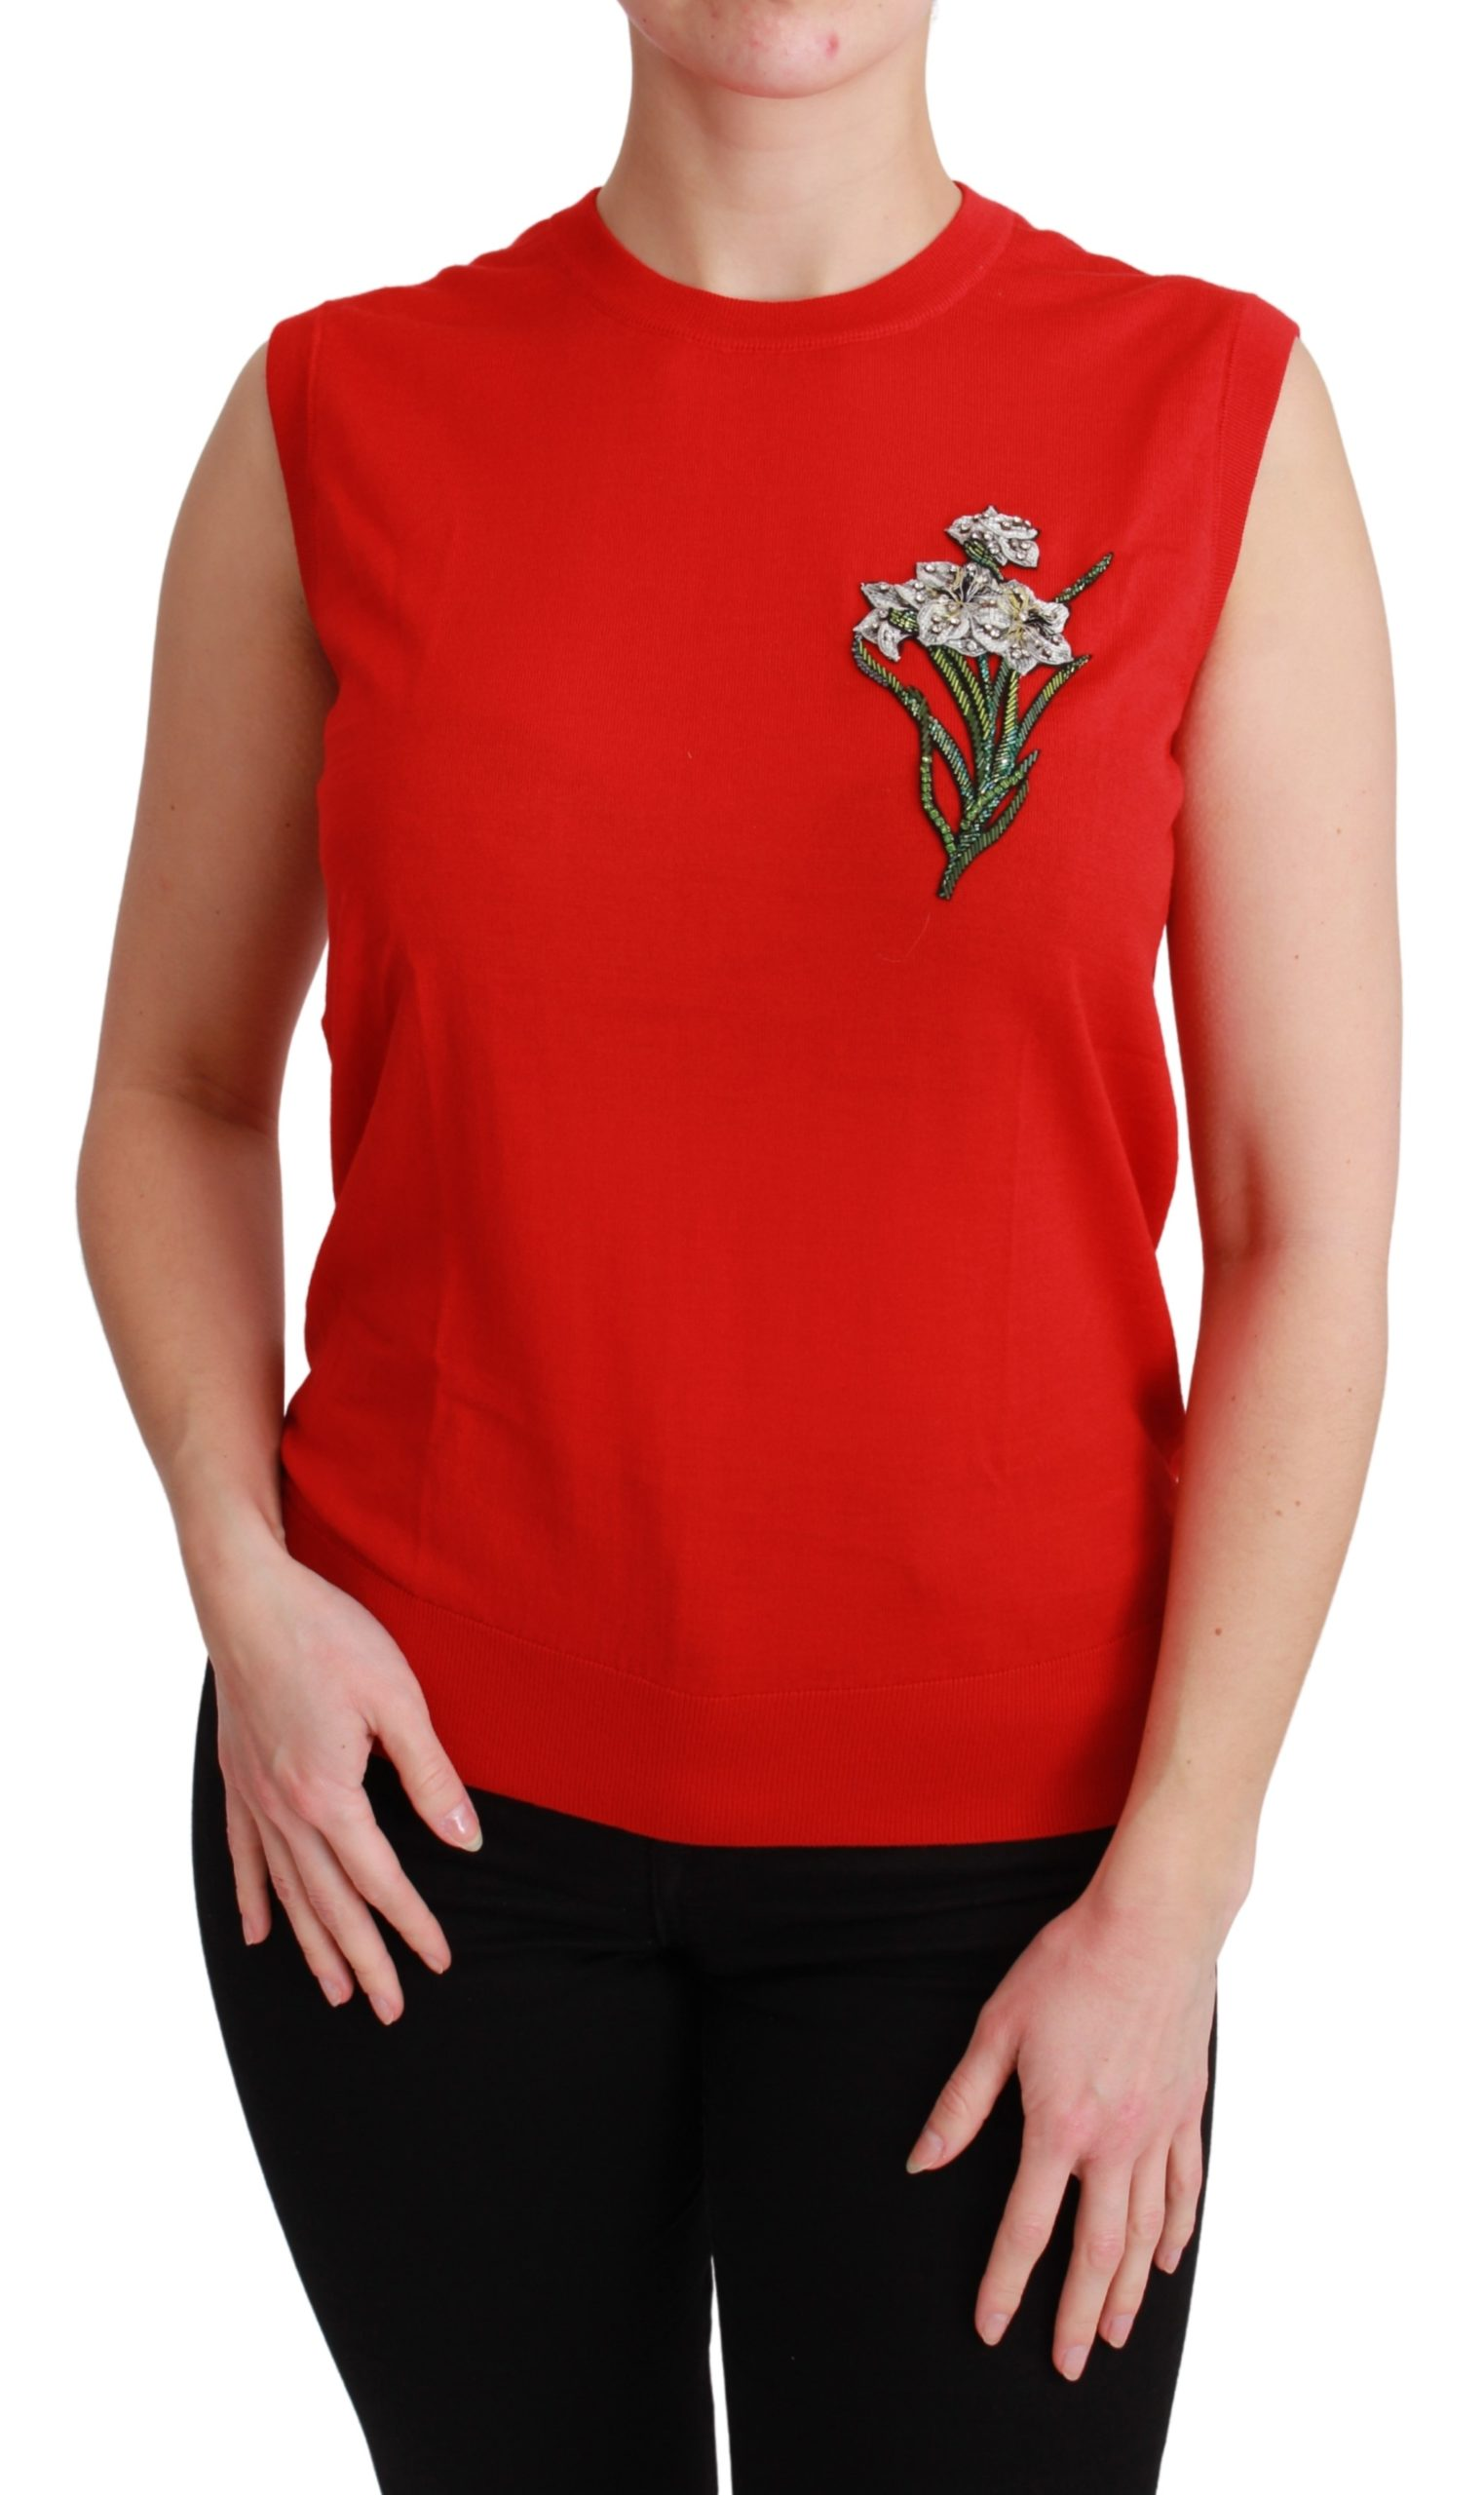 Dolce & Gabbana Women's Crystal Flower Top Red TSH4584 - IT44|L